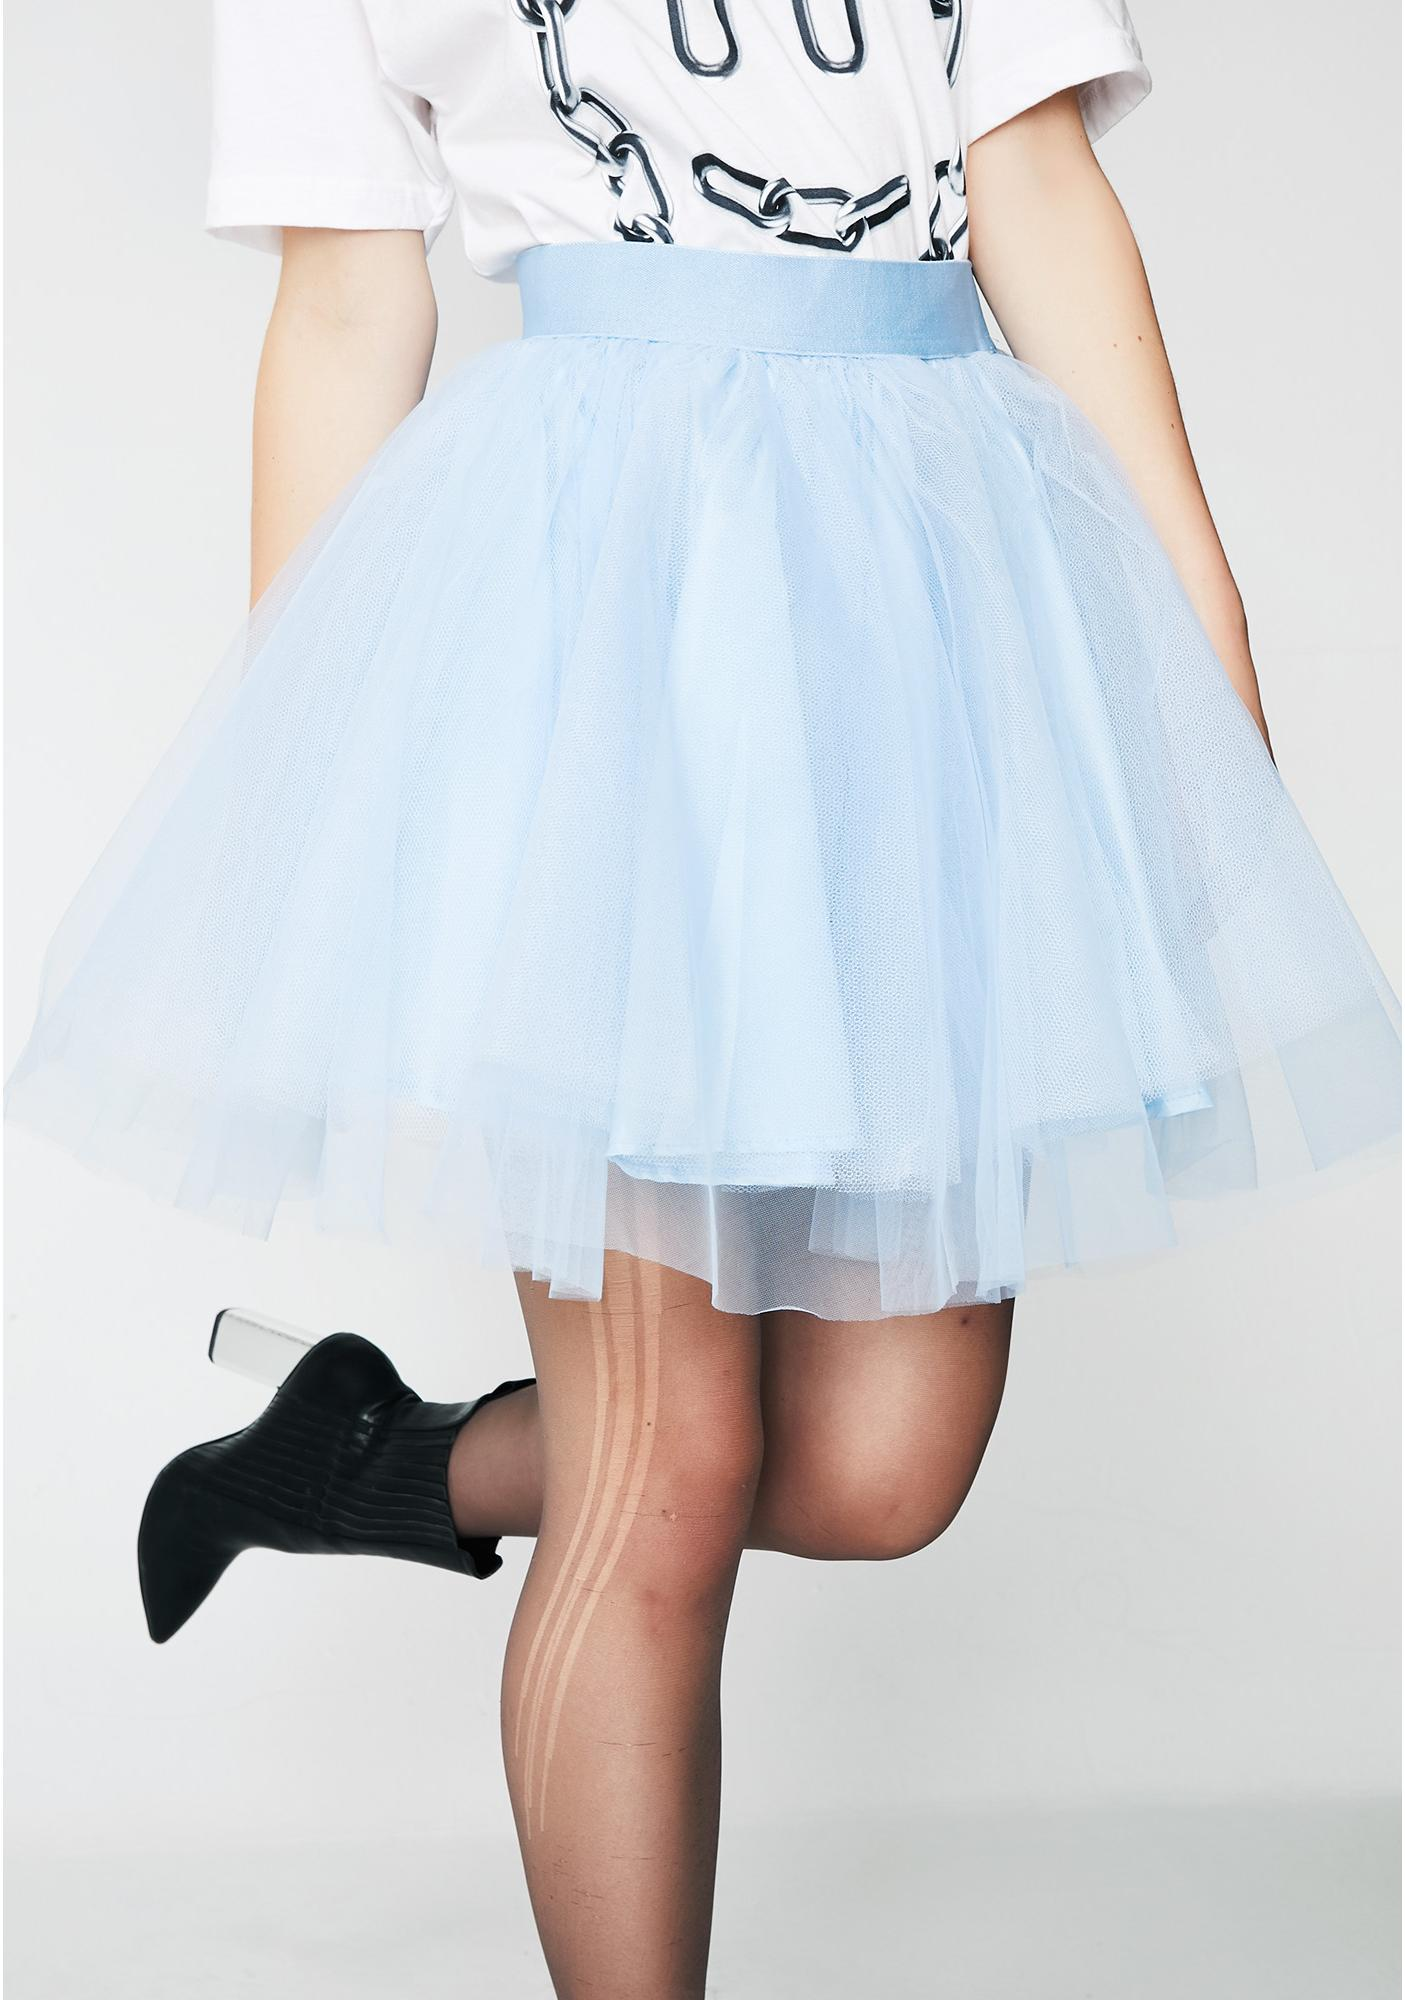 Kiki Riki Champagne Mami Tutu Skirt